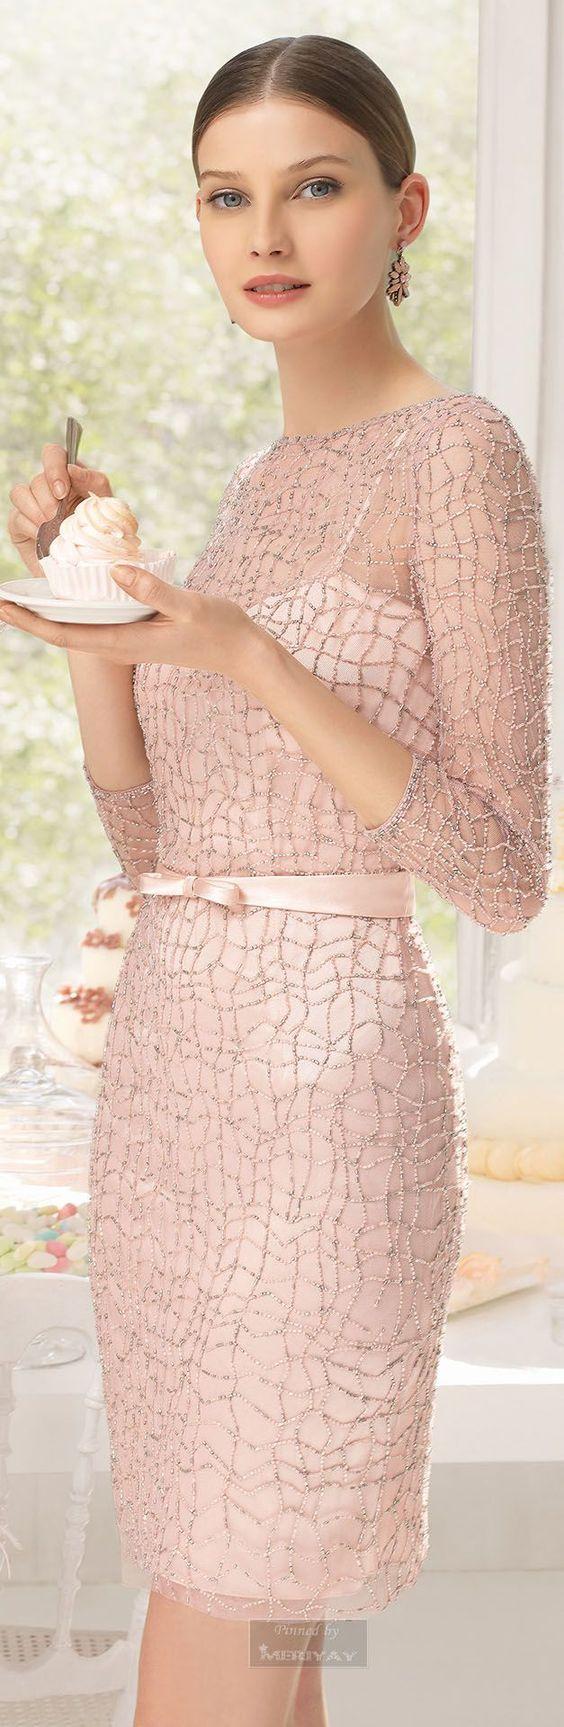 19 best Vestidos para gorditas images on Pinterest   Elegant dresses ...